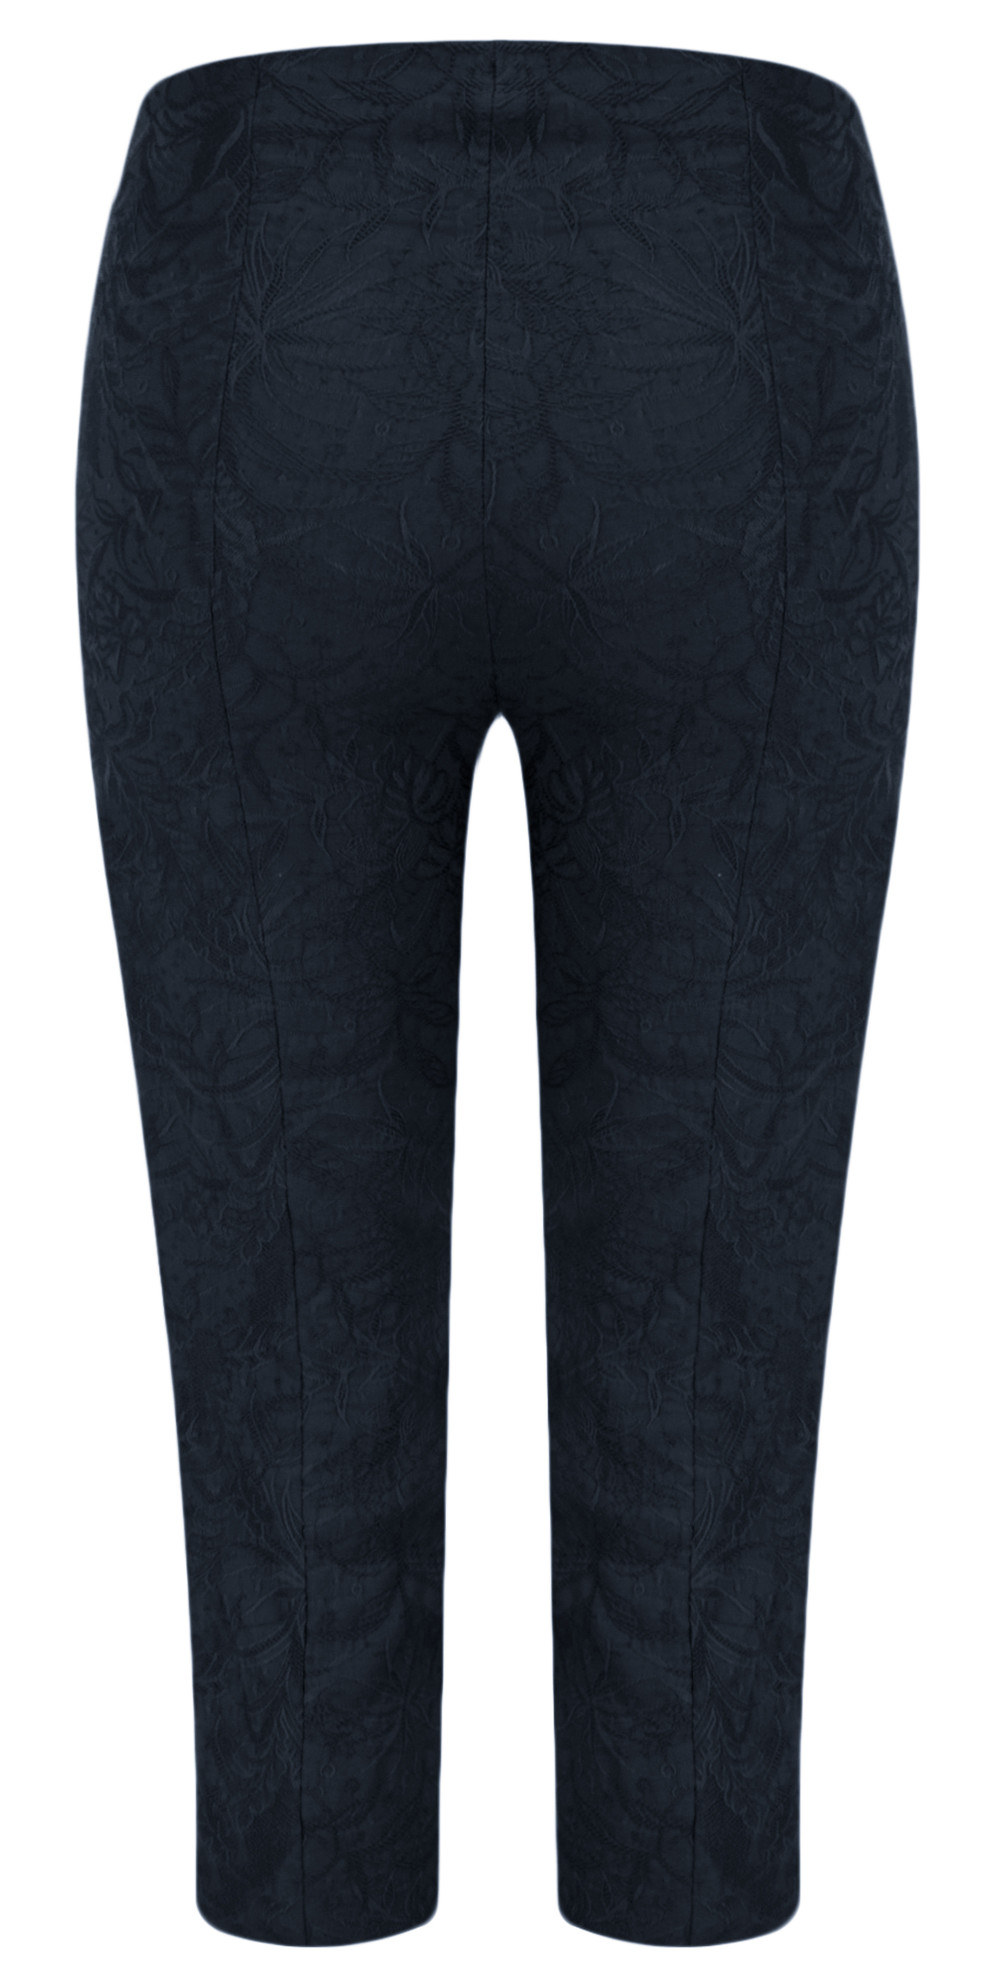 Marie 07 Navy Jacquard Crop Trouser main image